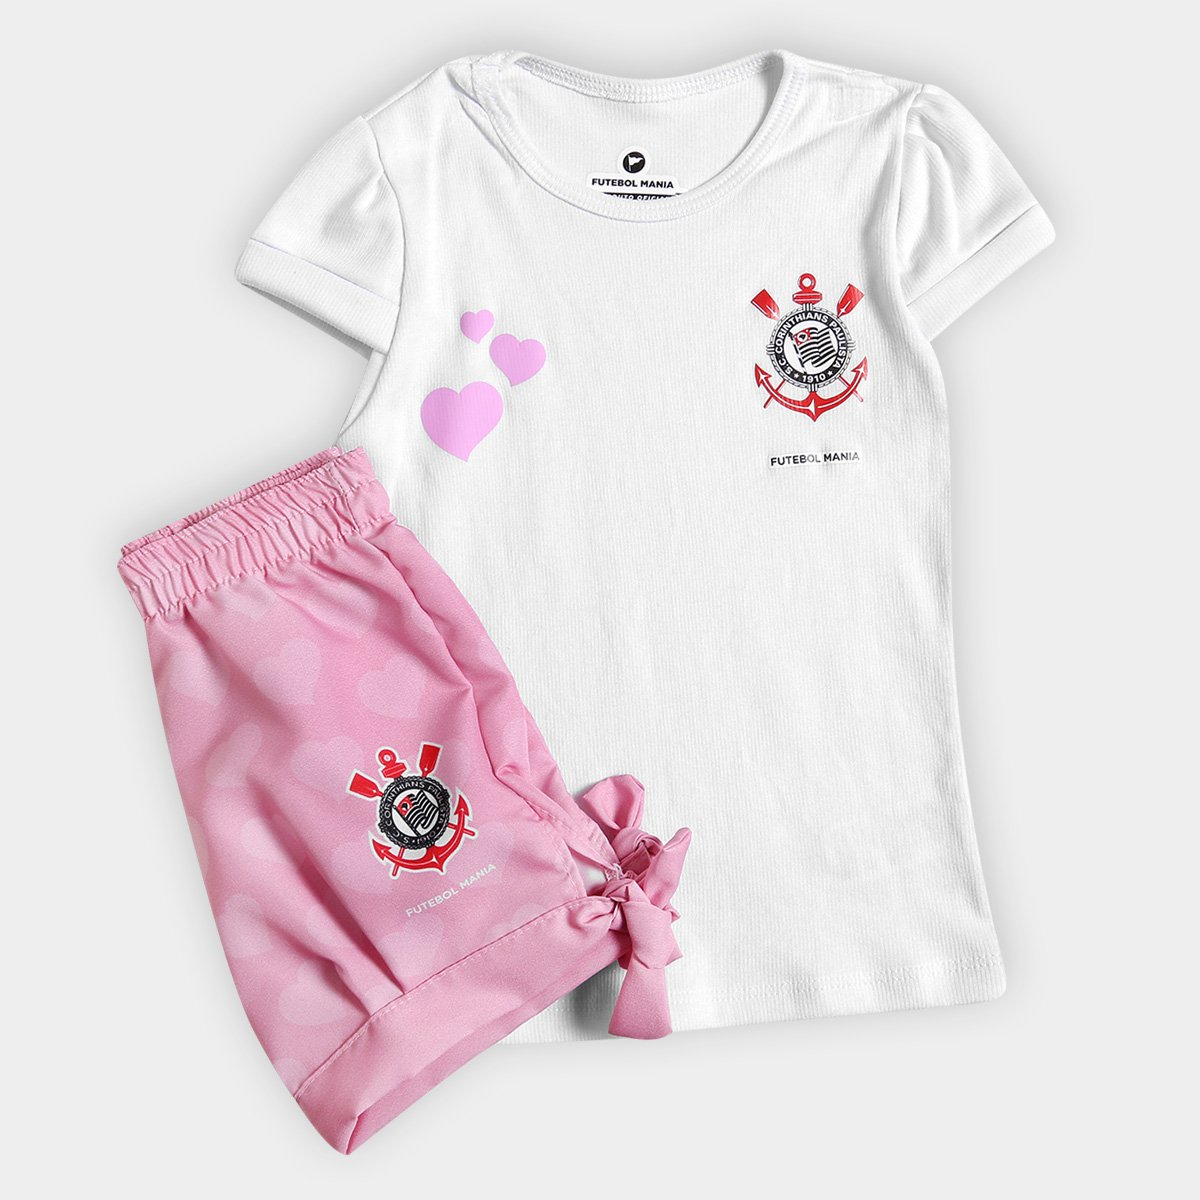 Conjunto Corinthians Infantil Torcida Baby Estilo II - Compre Agora ... af3386d8f5337